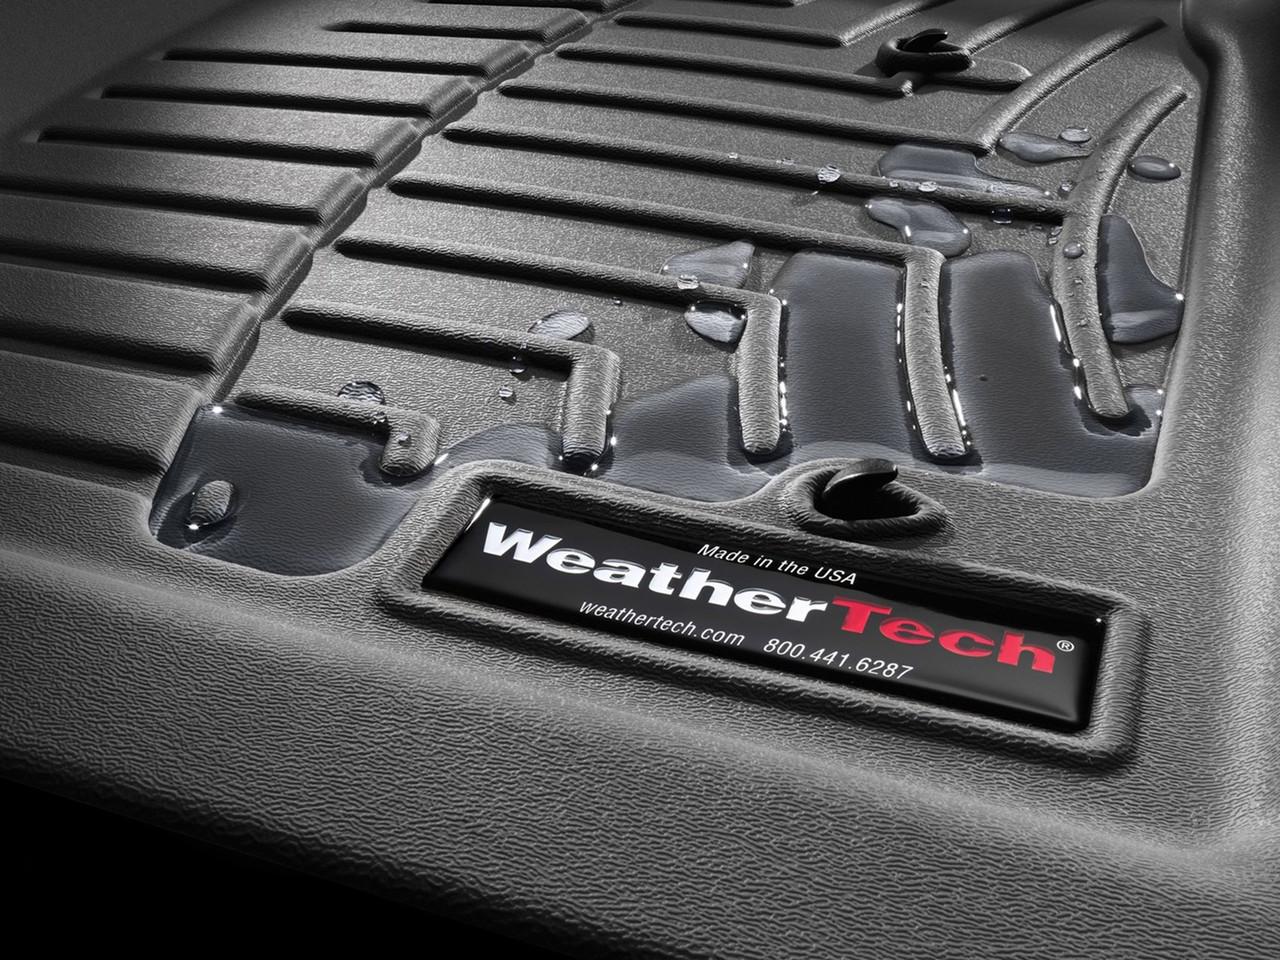 2020-2022 Hyundai Palisade WeatherTech Floor Liners - Close Up